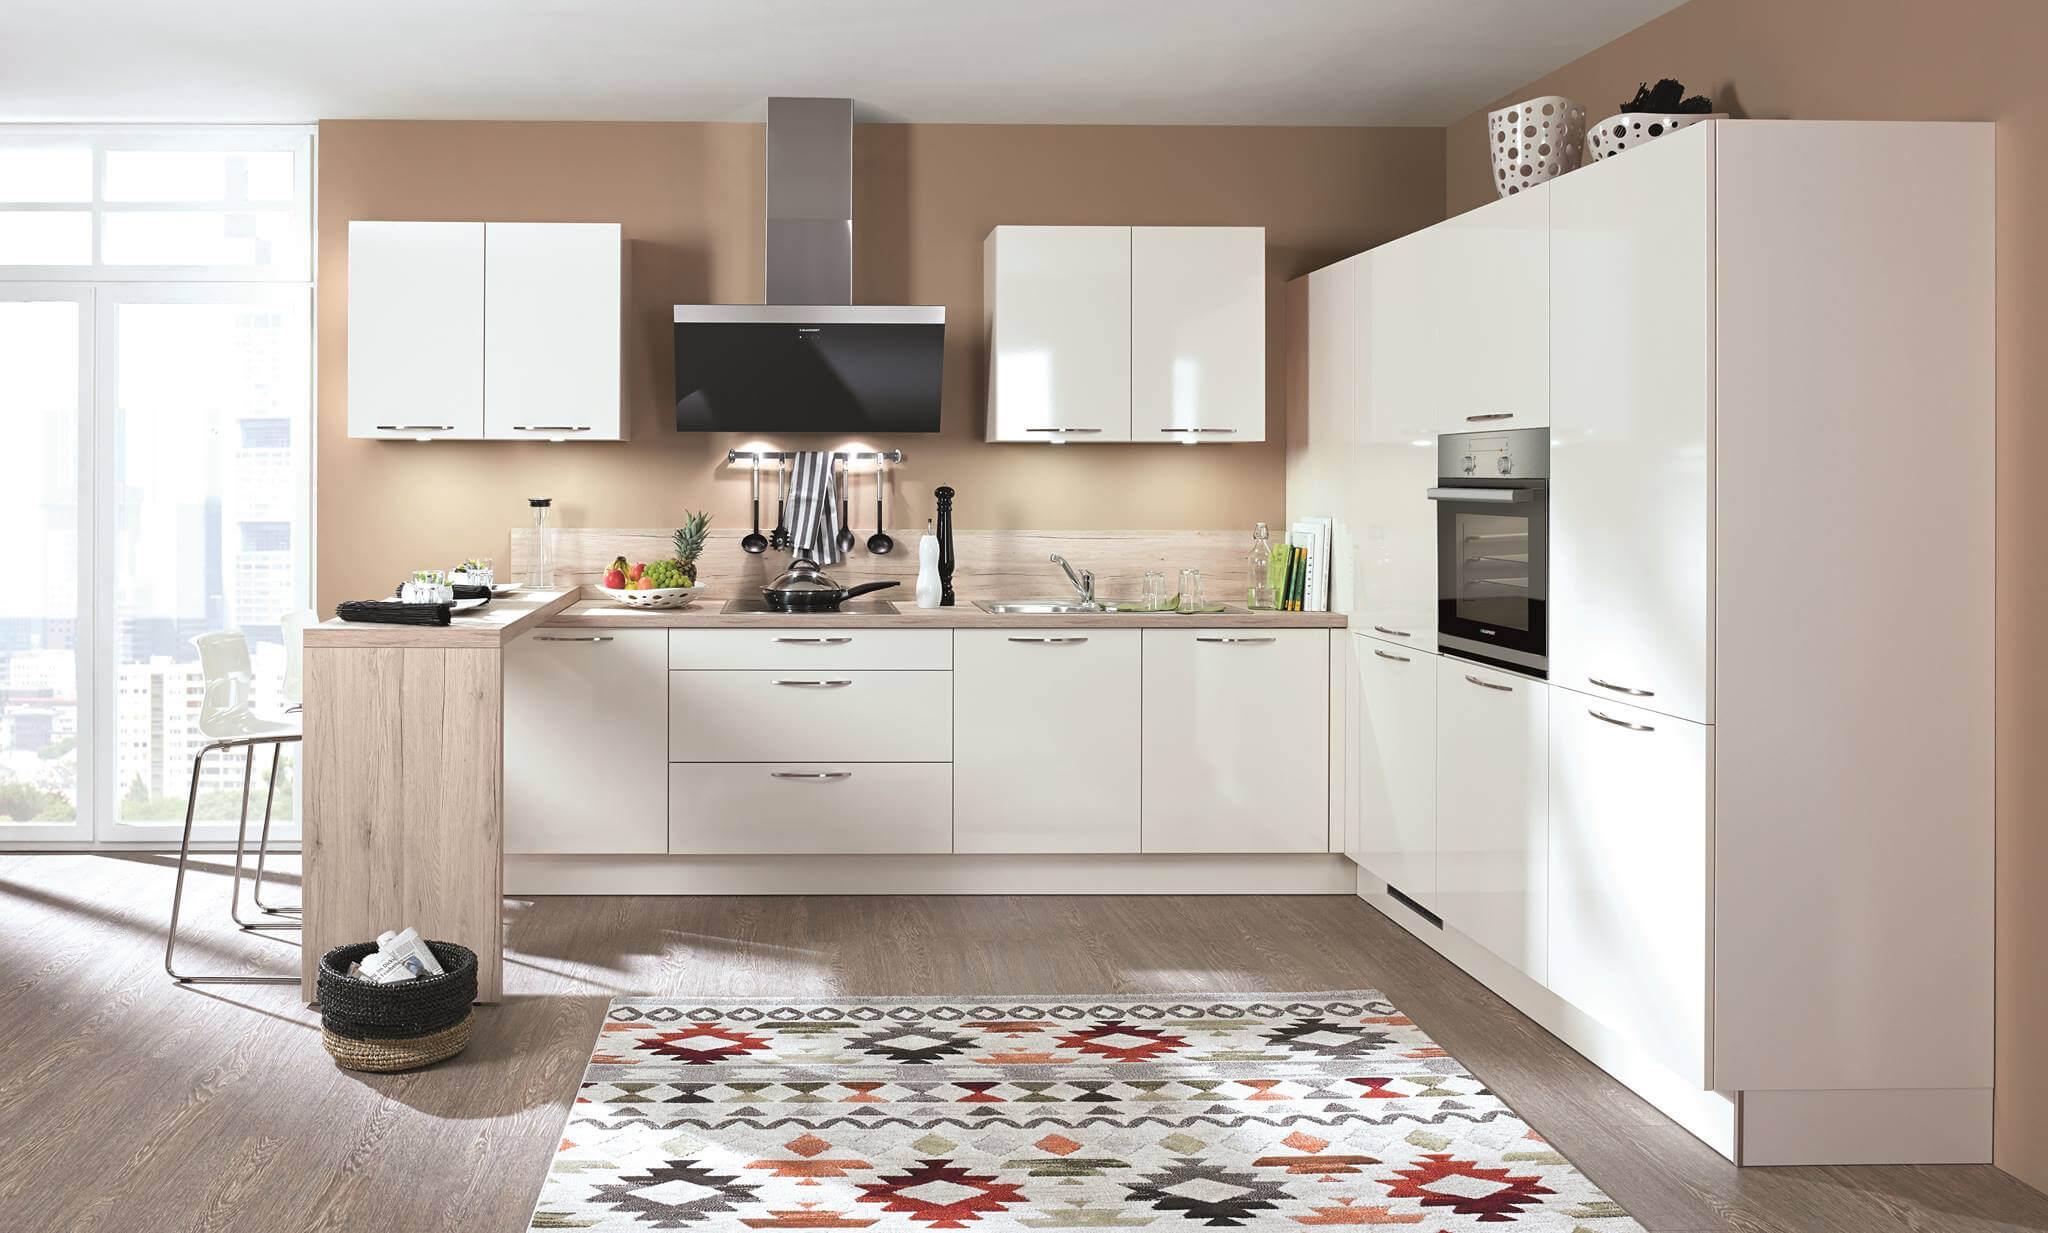 unsere angebote k chen exquisit. Black Bedroom Furniture Sets. Home Design Ideas